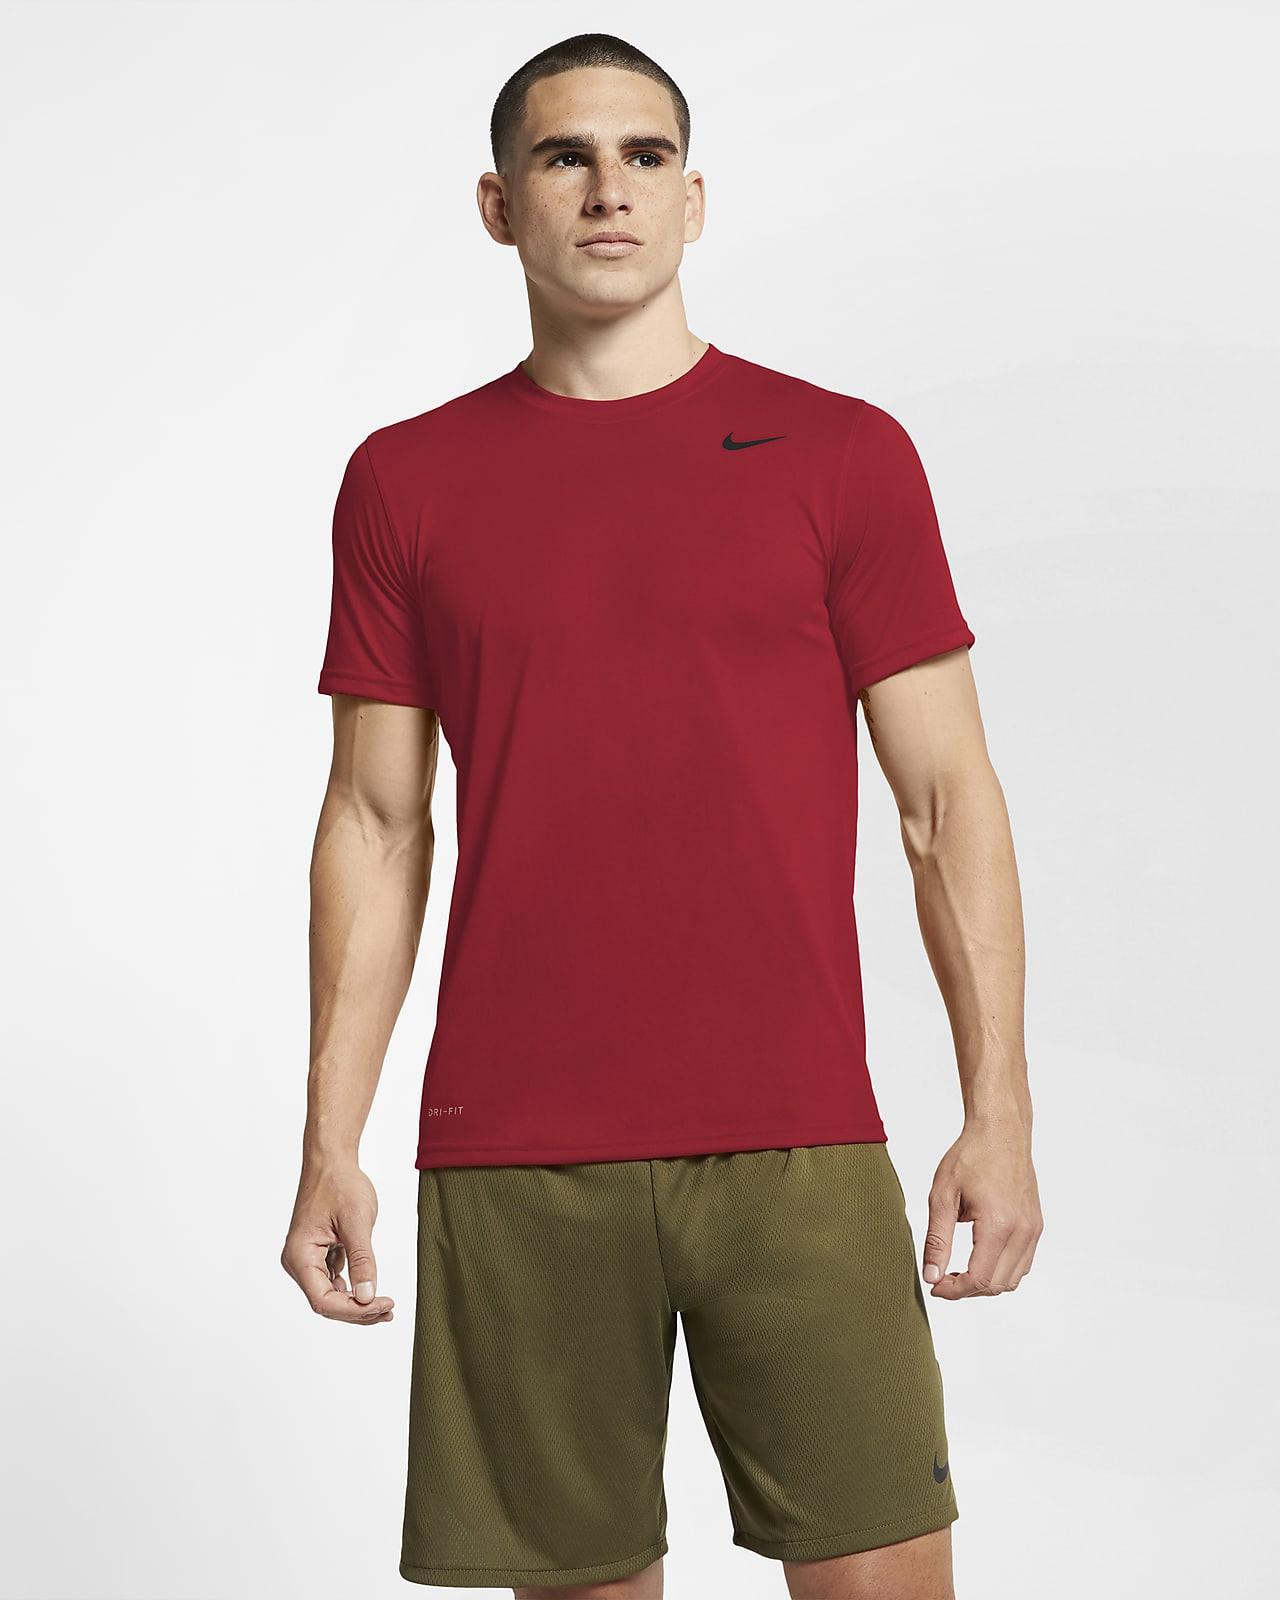 Nike Drifit Legend Men's Training Tshirt Nike